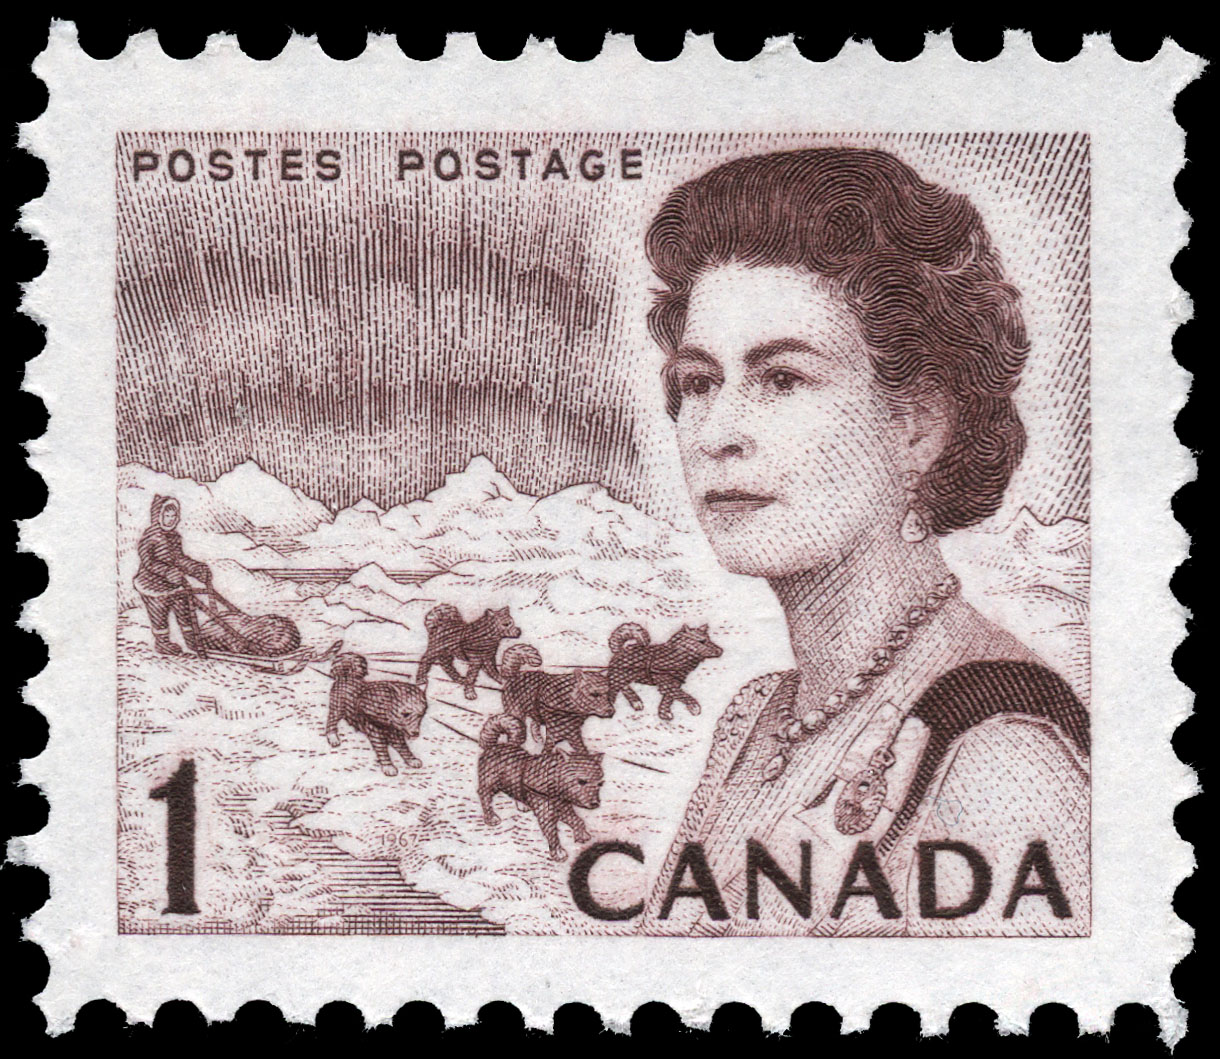 Queen Elizabeth II, Northern Regions Canada Postage Stamp